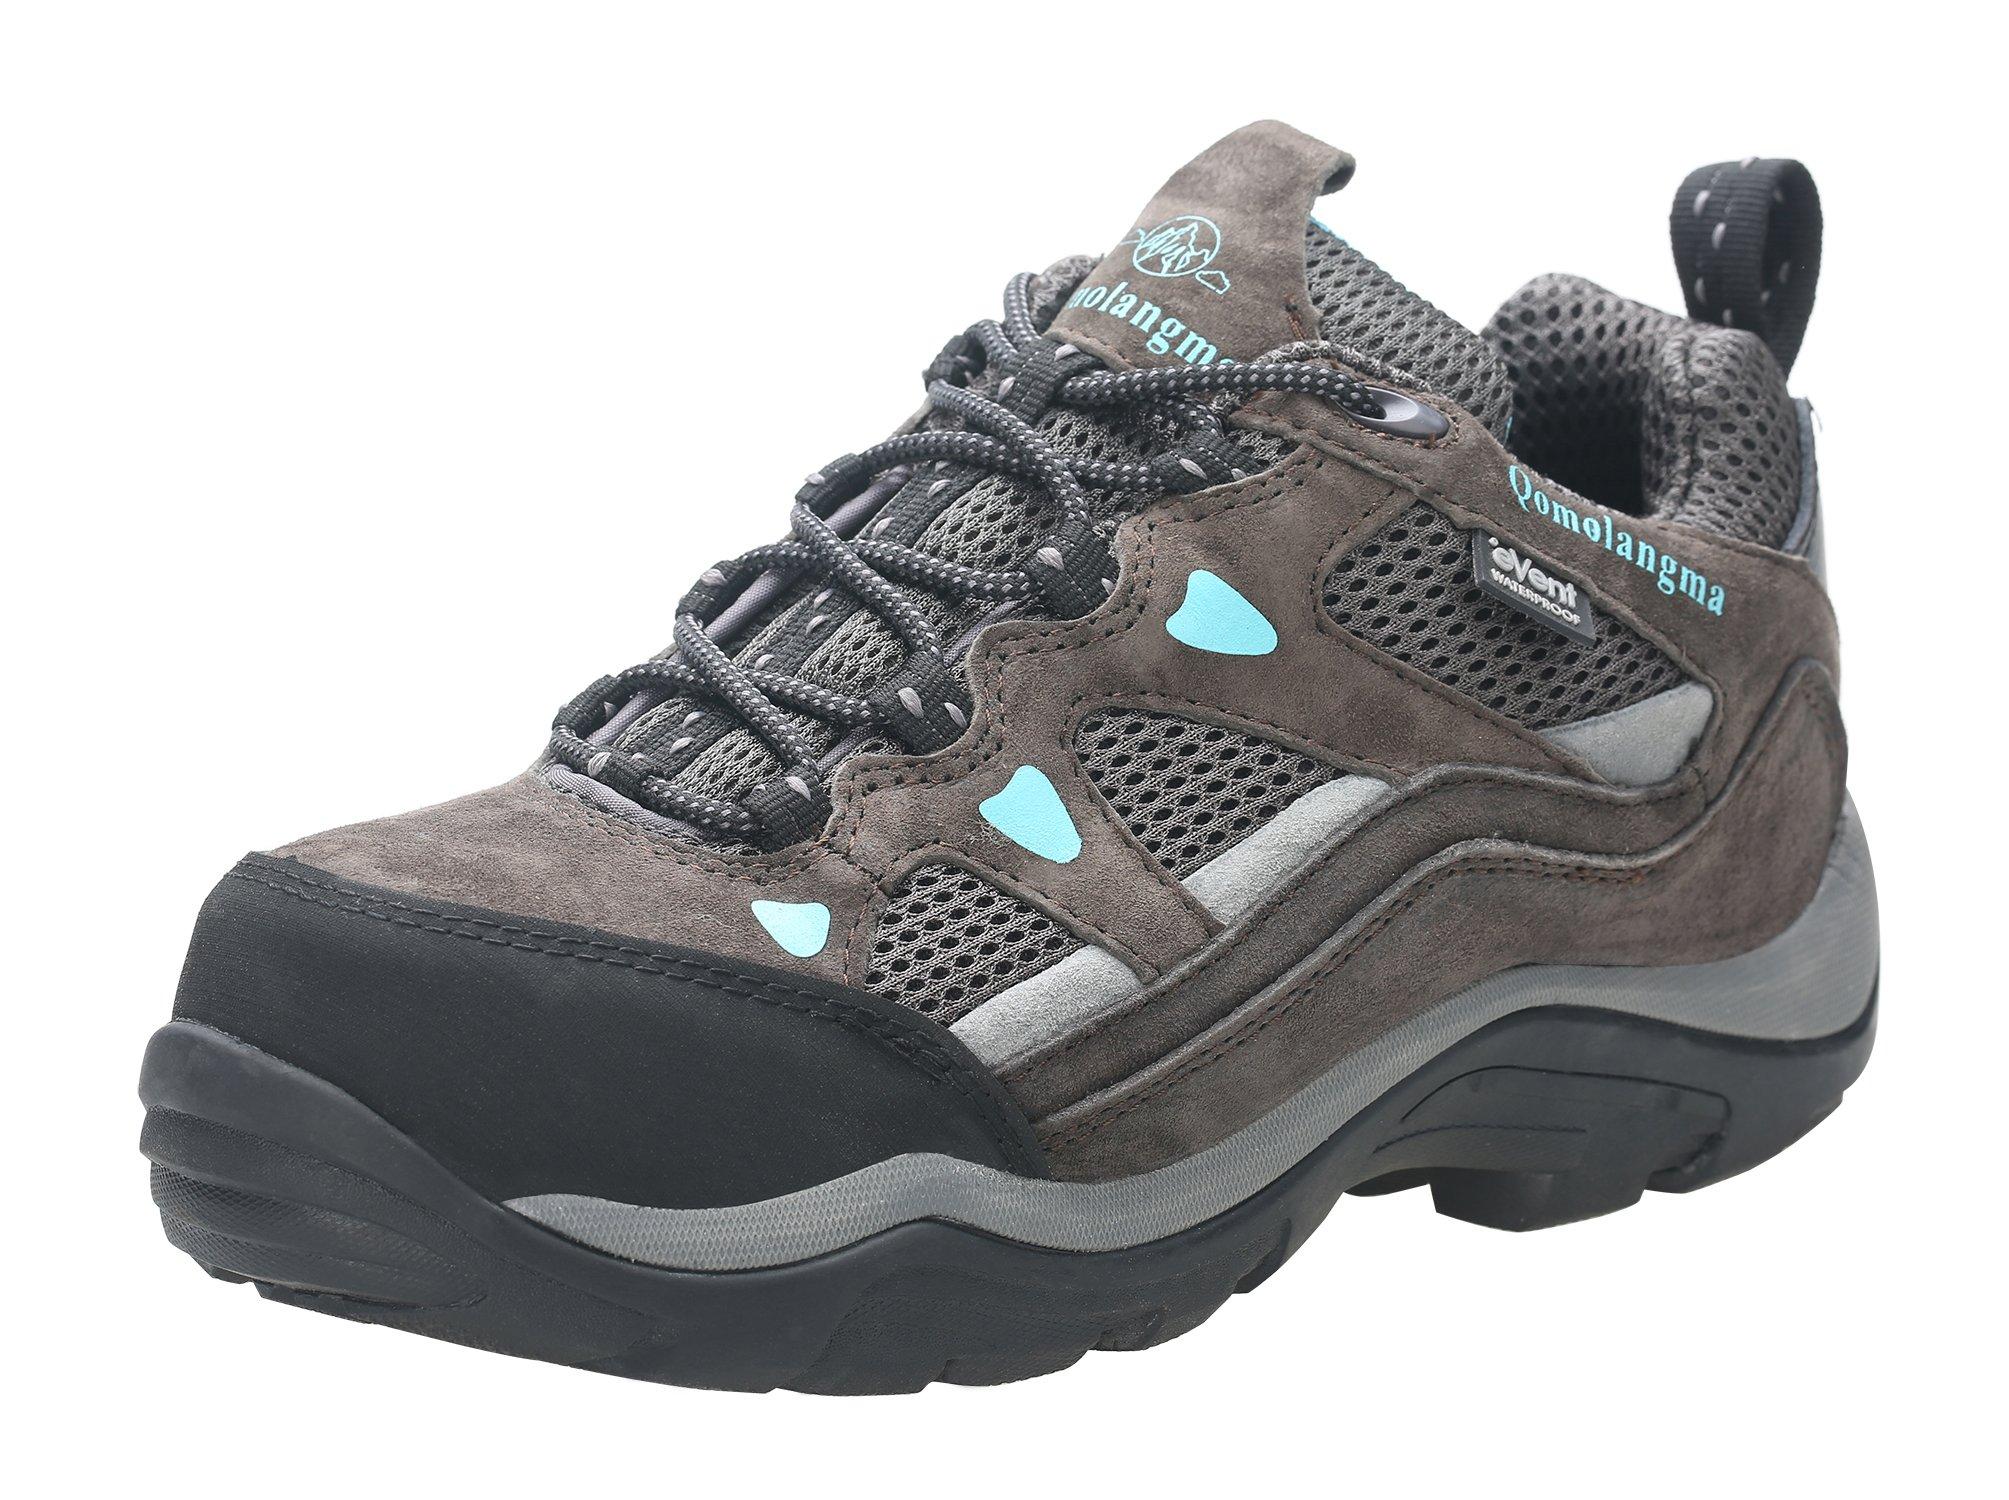 QOMOLANGMA Women's Waterproof Wide Hiking Shoes Anti-Skid Walking Sneaker Running Trekking Outdoor